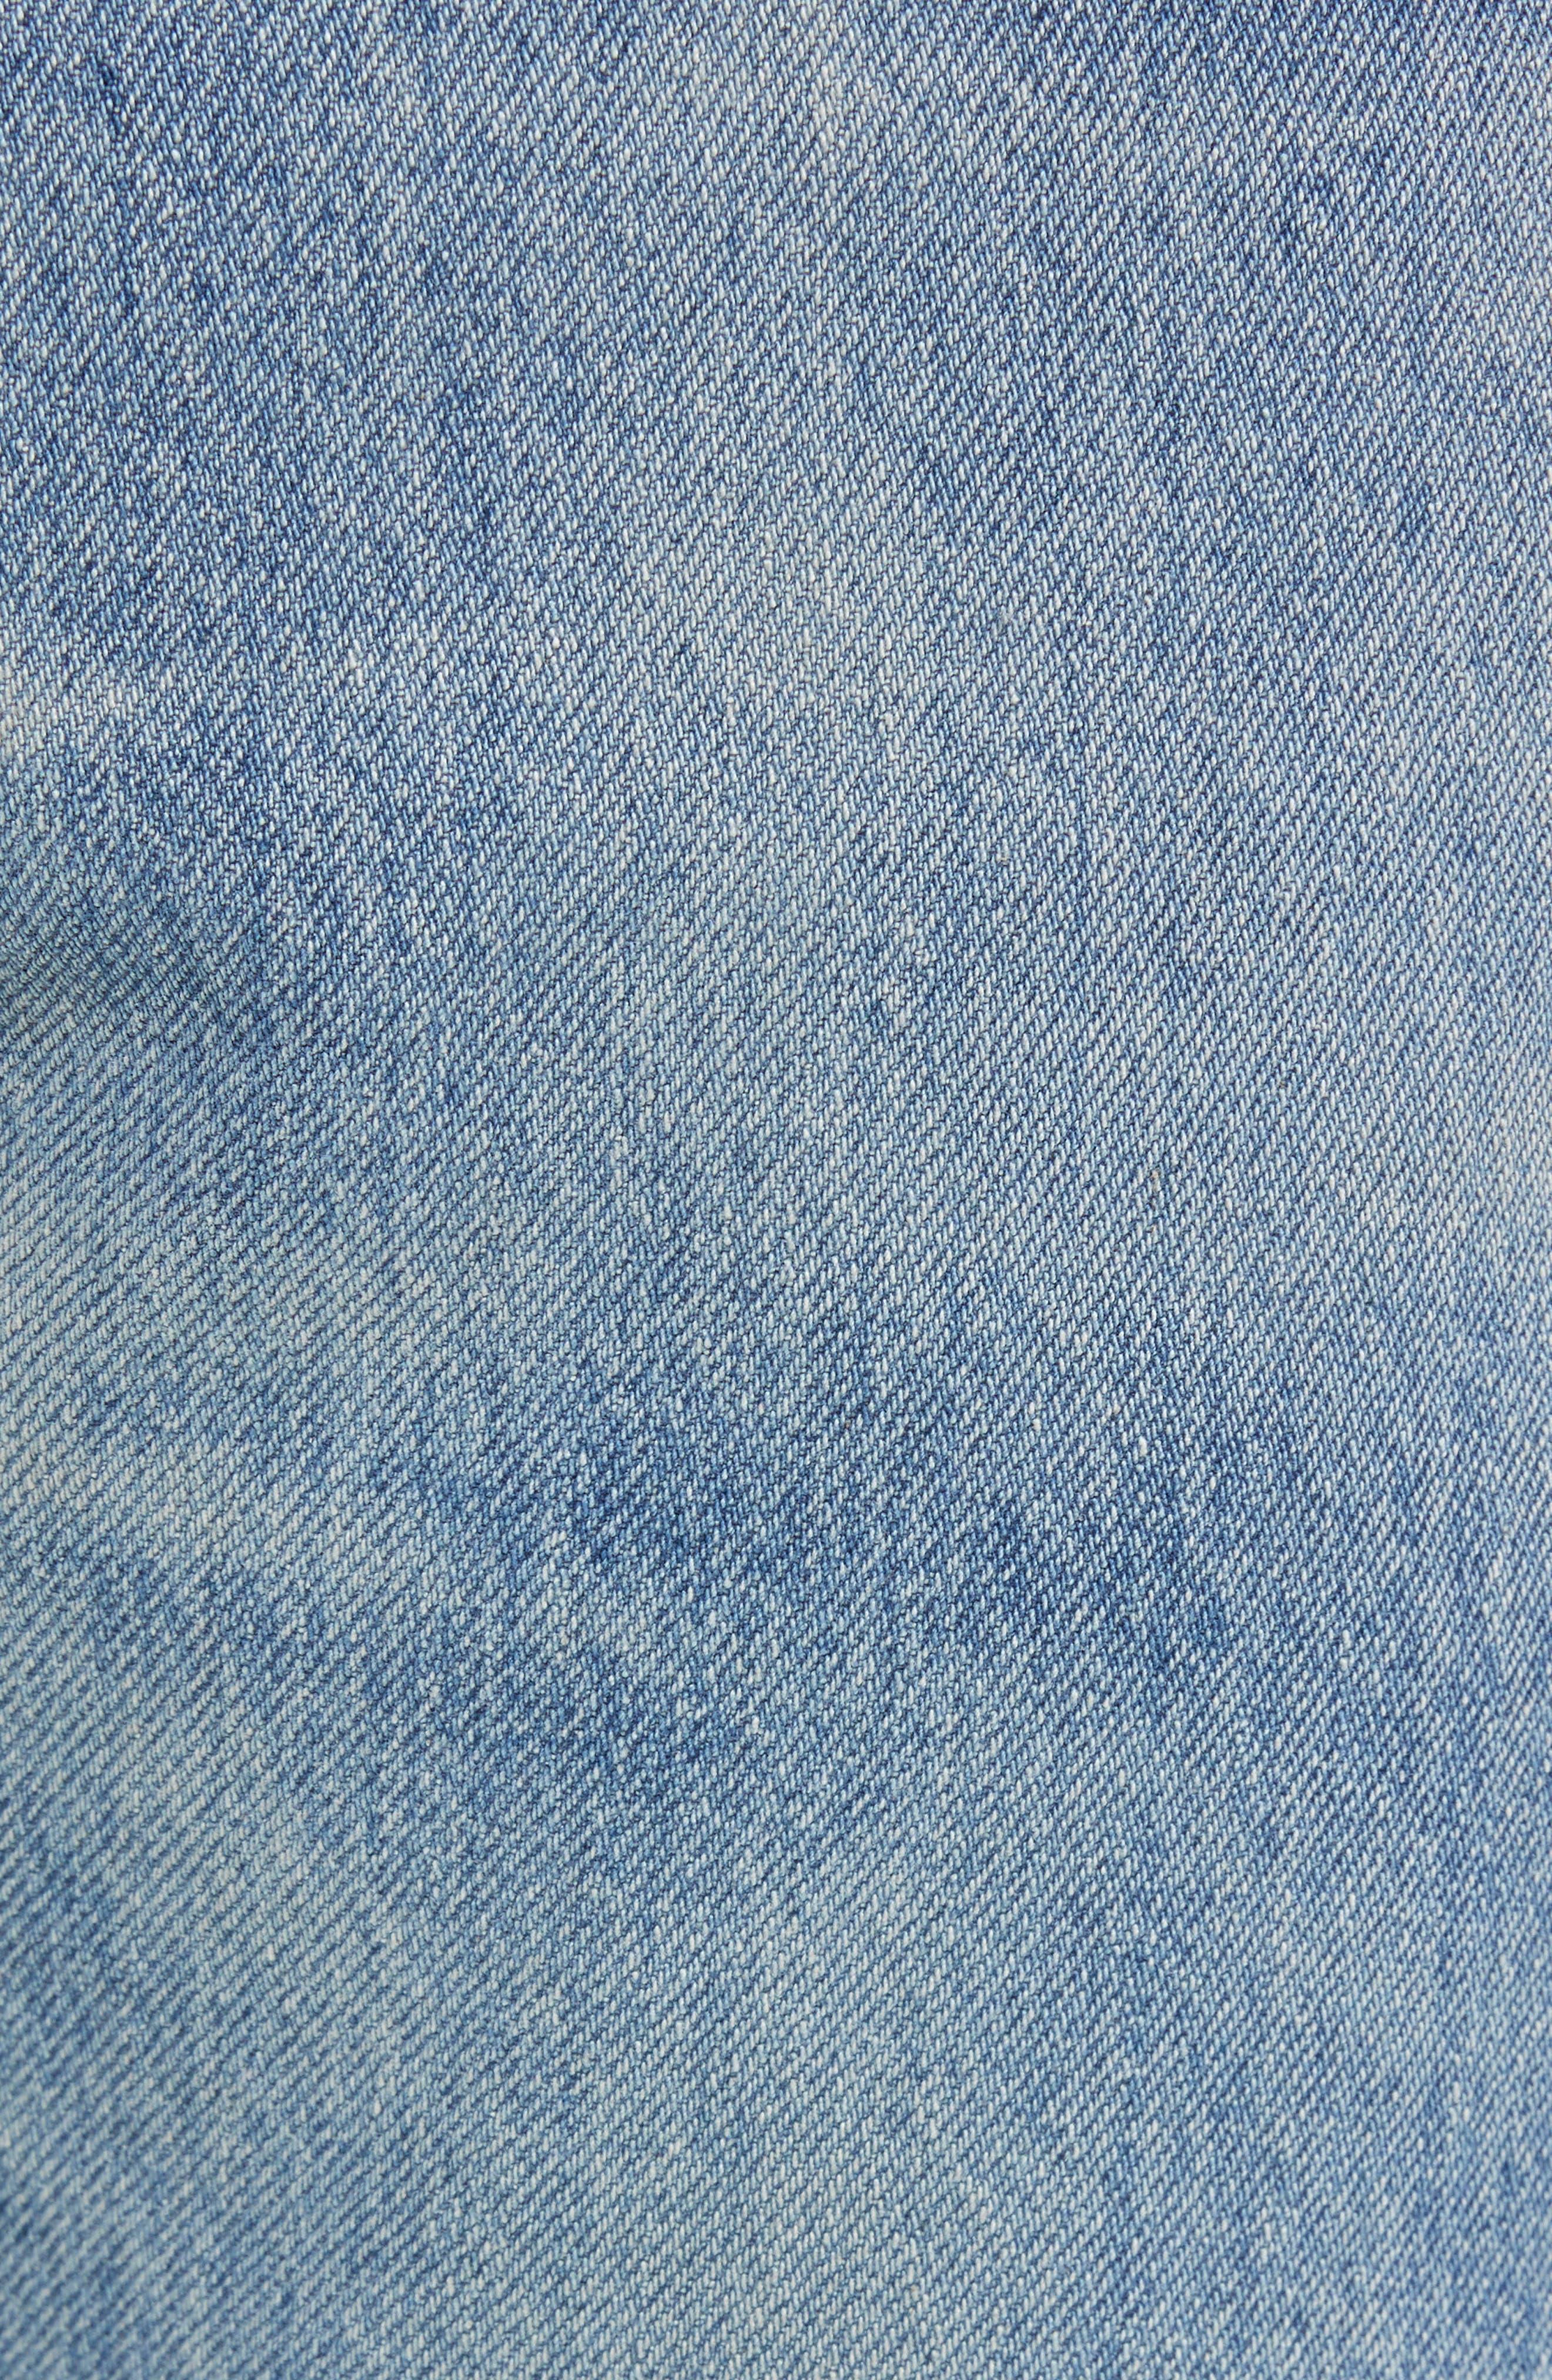 501<sup>™</sup> Slim Fit Jeans,                             Alternate thumbnail 5, color,                             SINGLE PAYER WARP